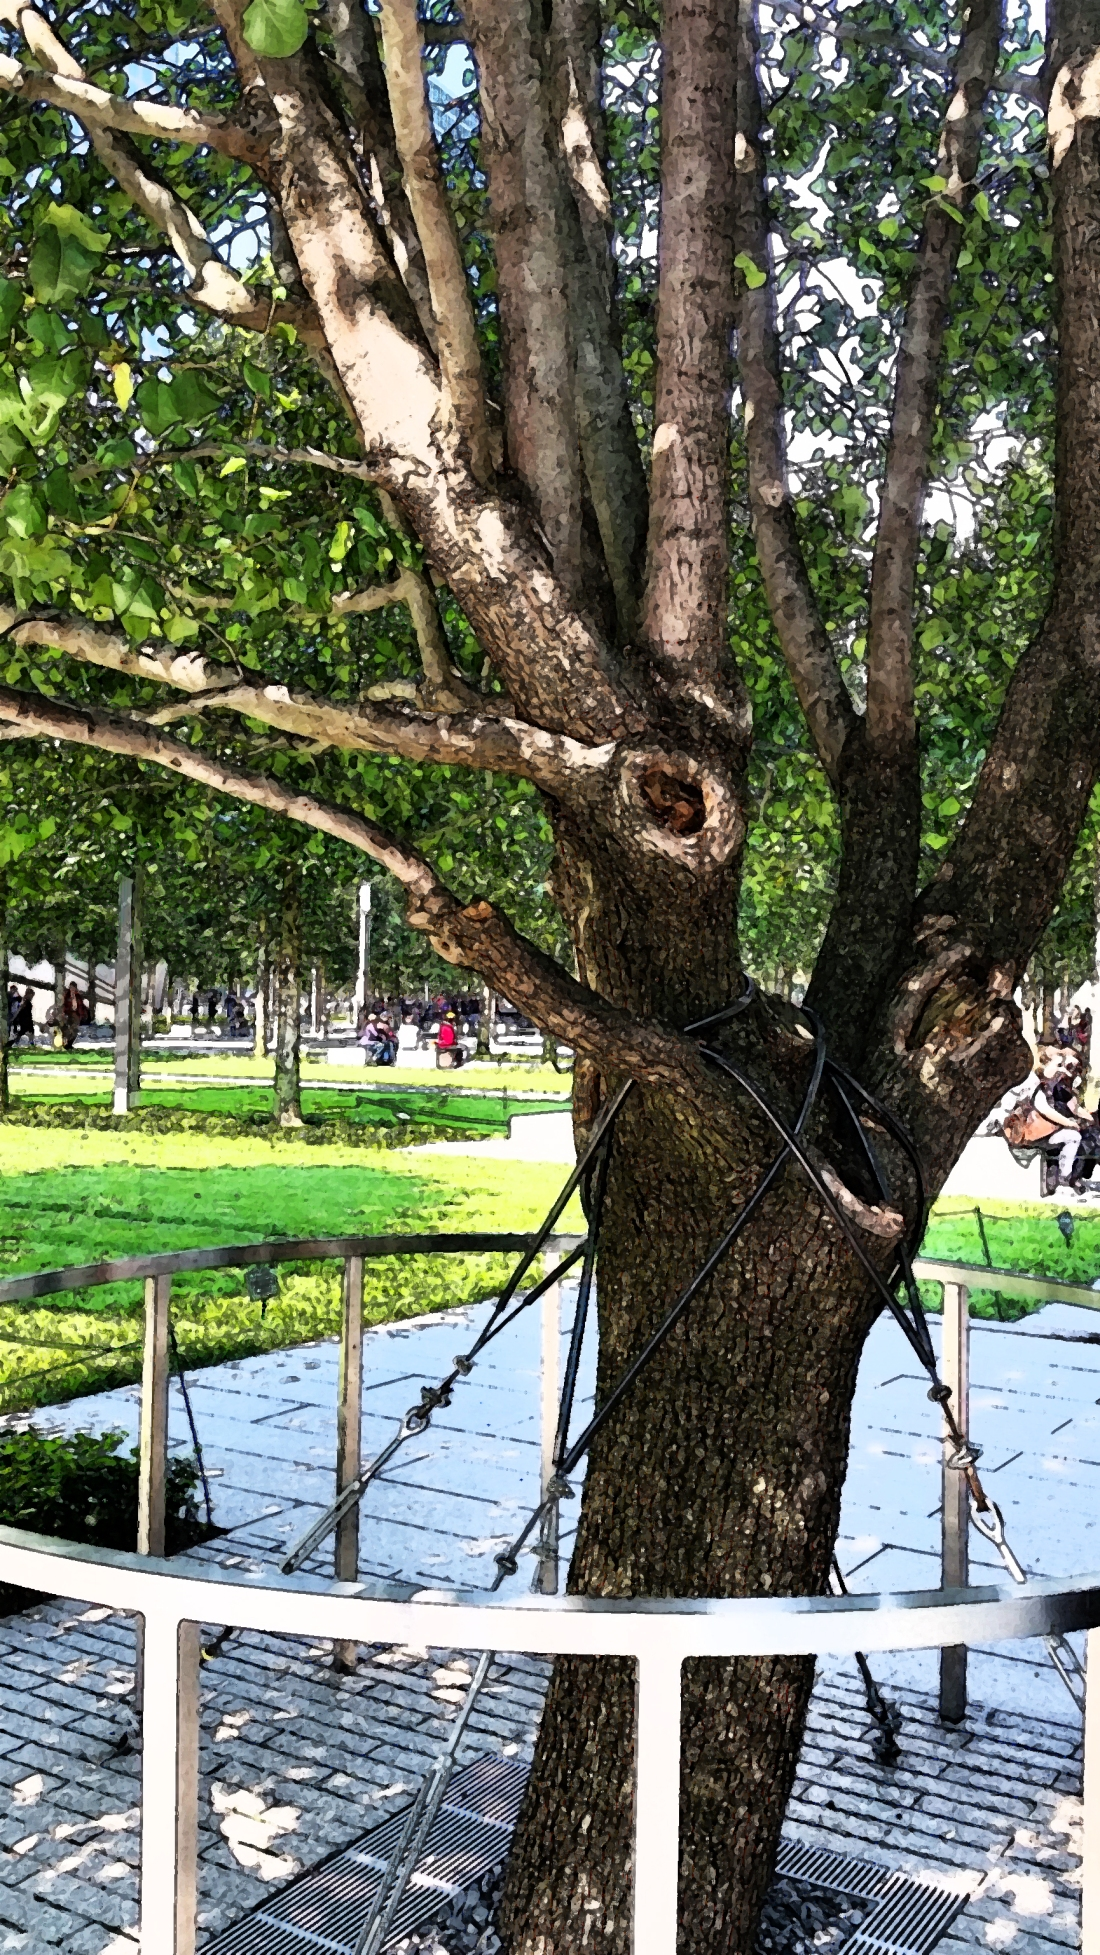 The Survivor Tree, Ground Zero